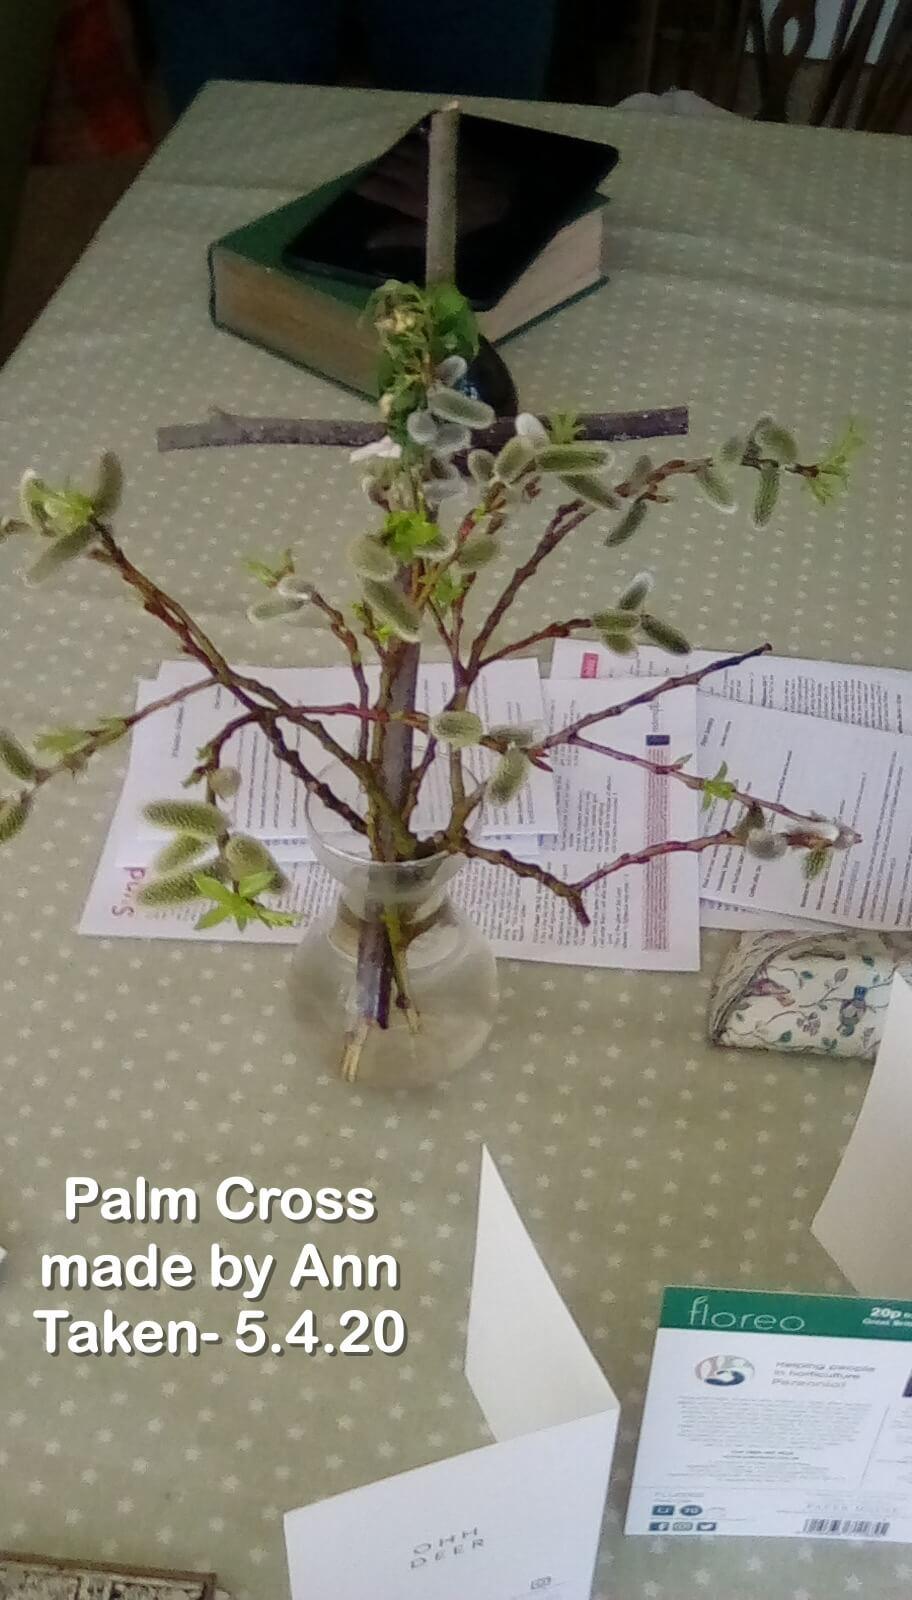 Palm Cross made by Ann